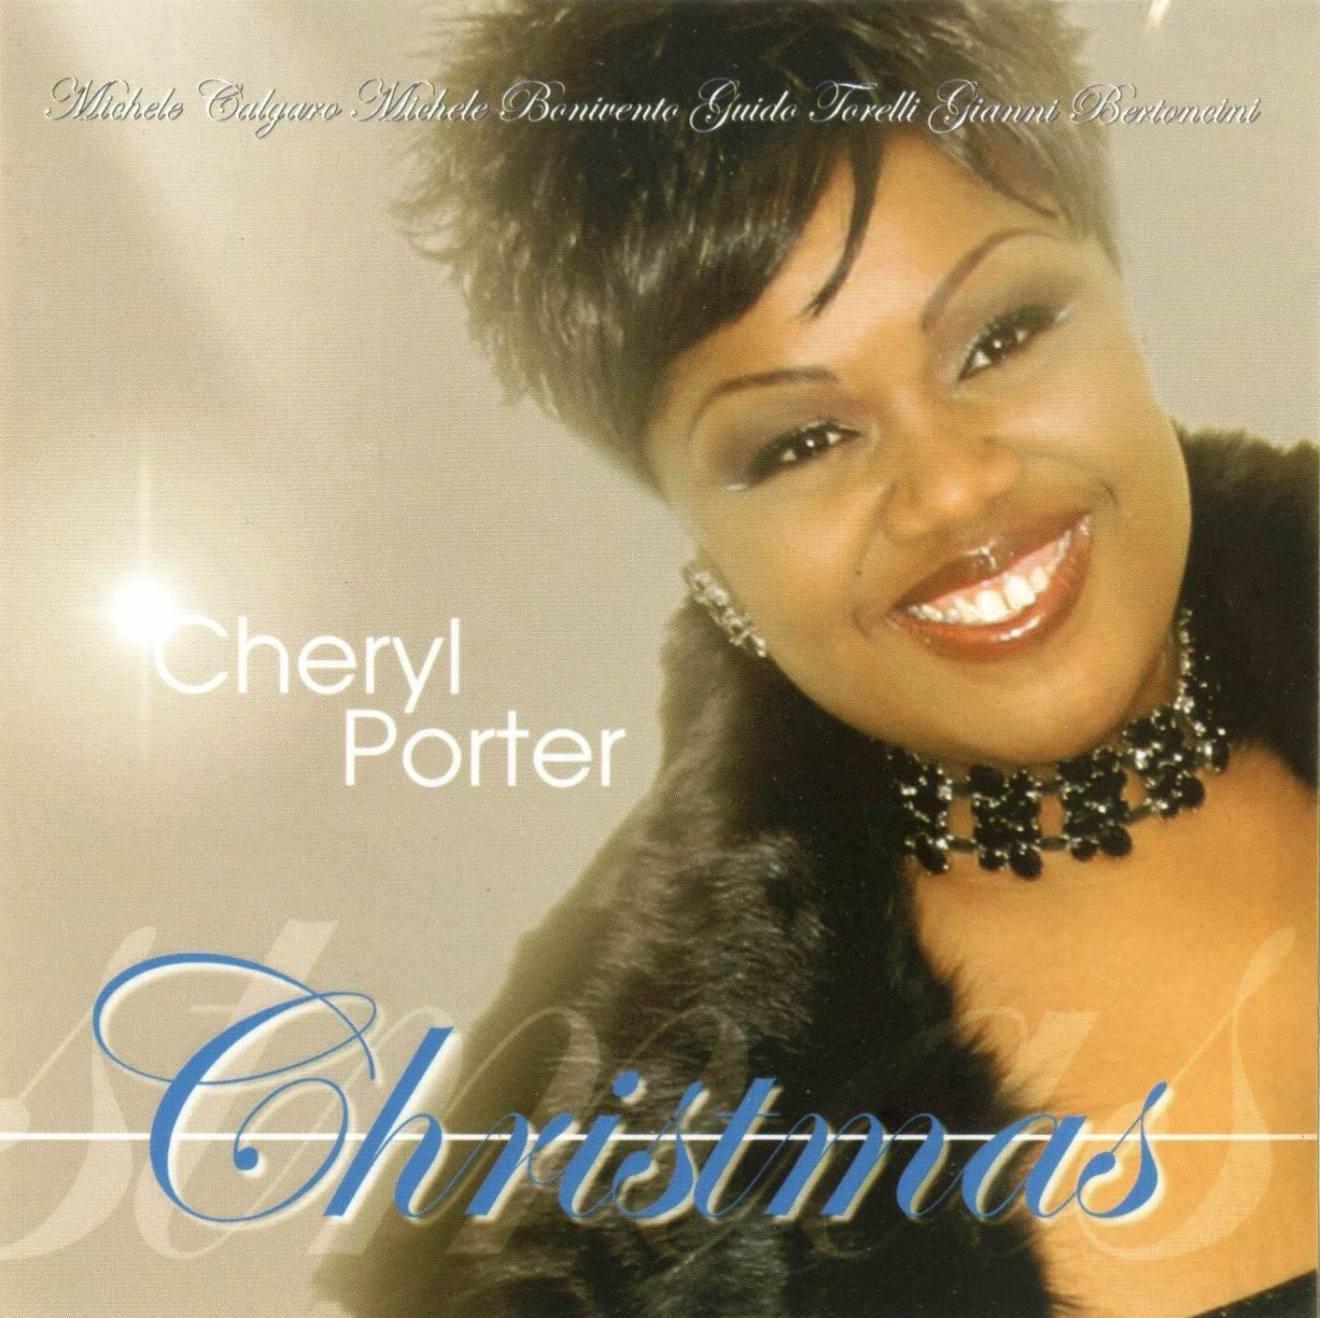 Cheryl Porter. Christmas